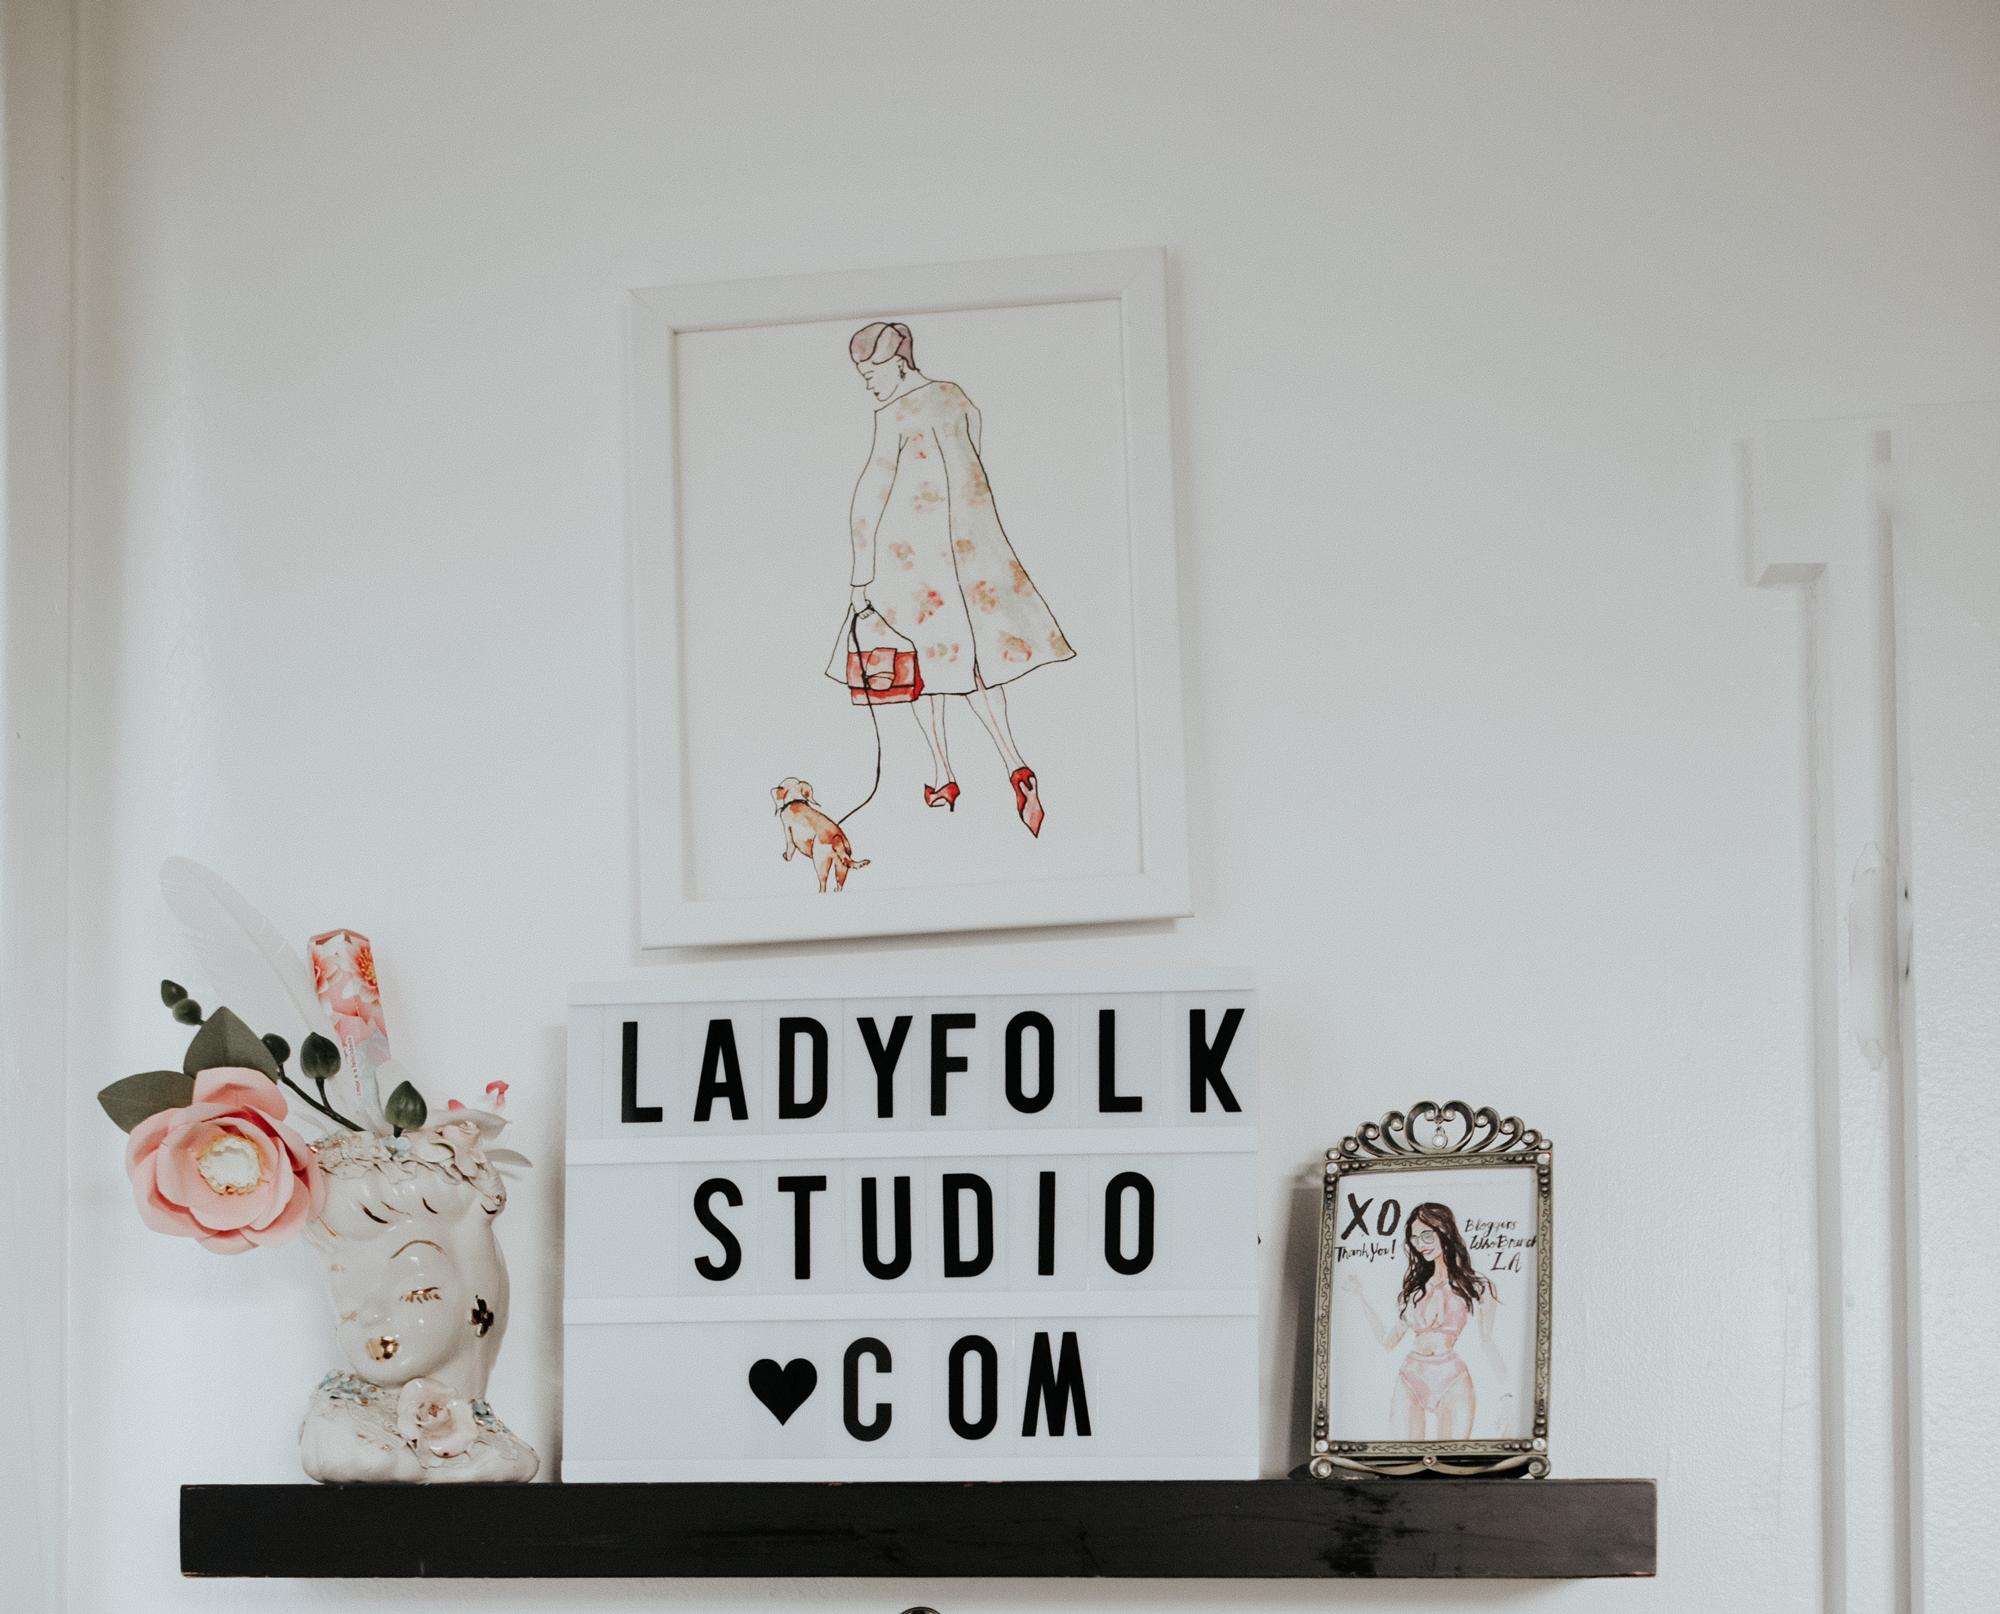 LadyfolkStudio-small-art-dogwalk.jpg